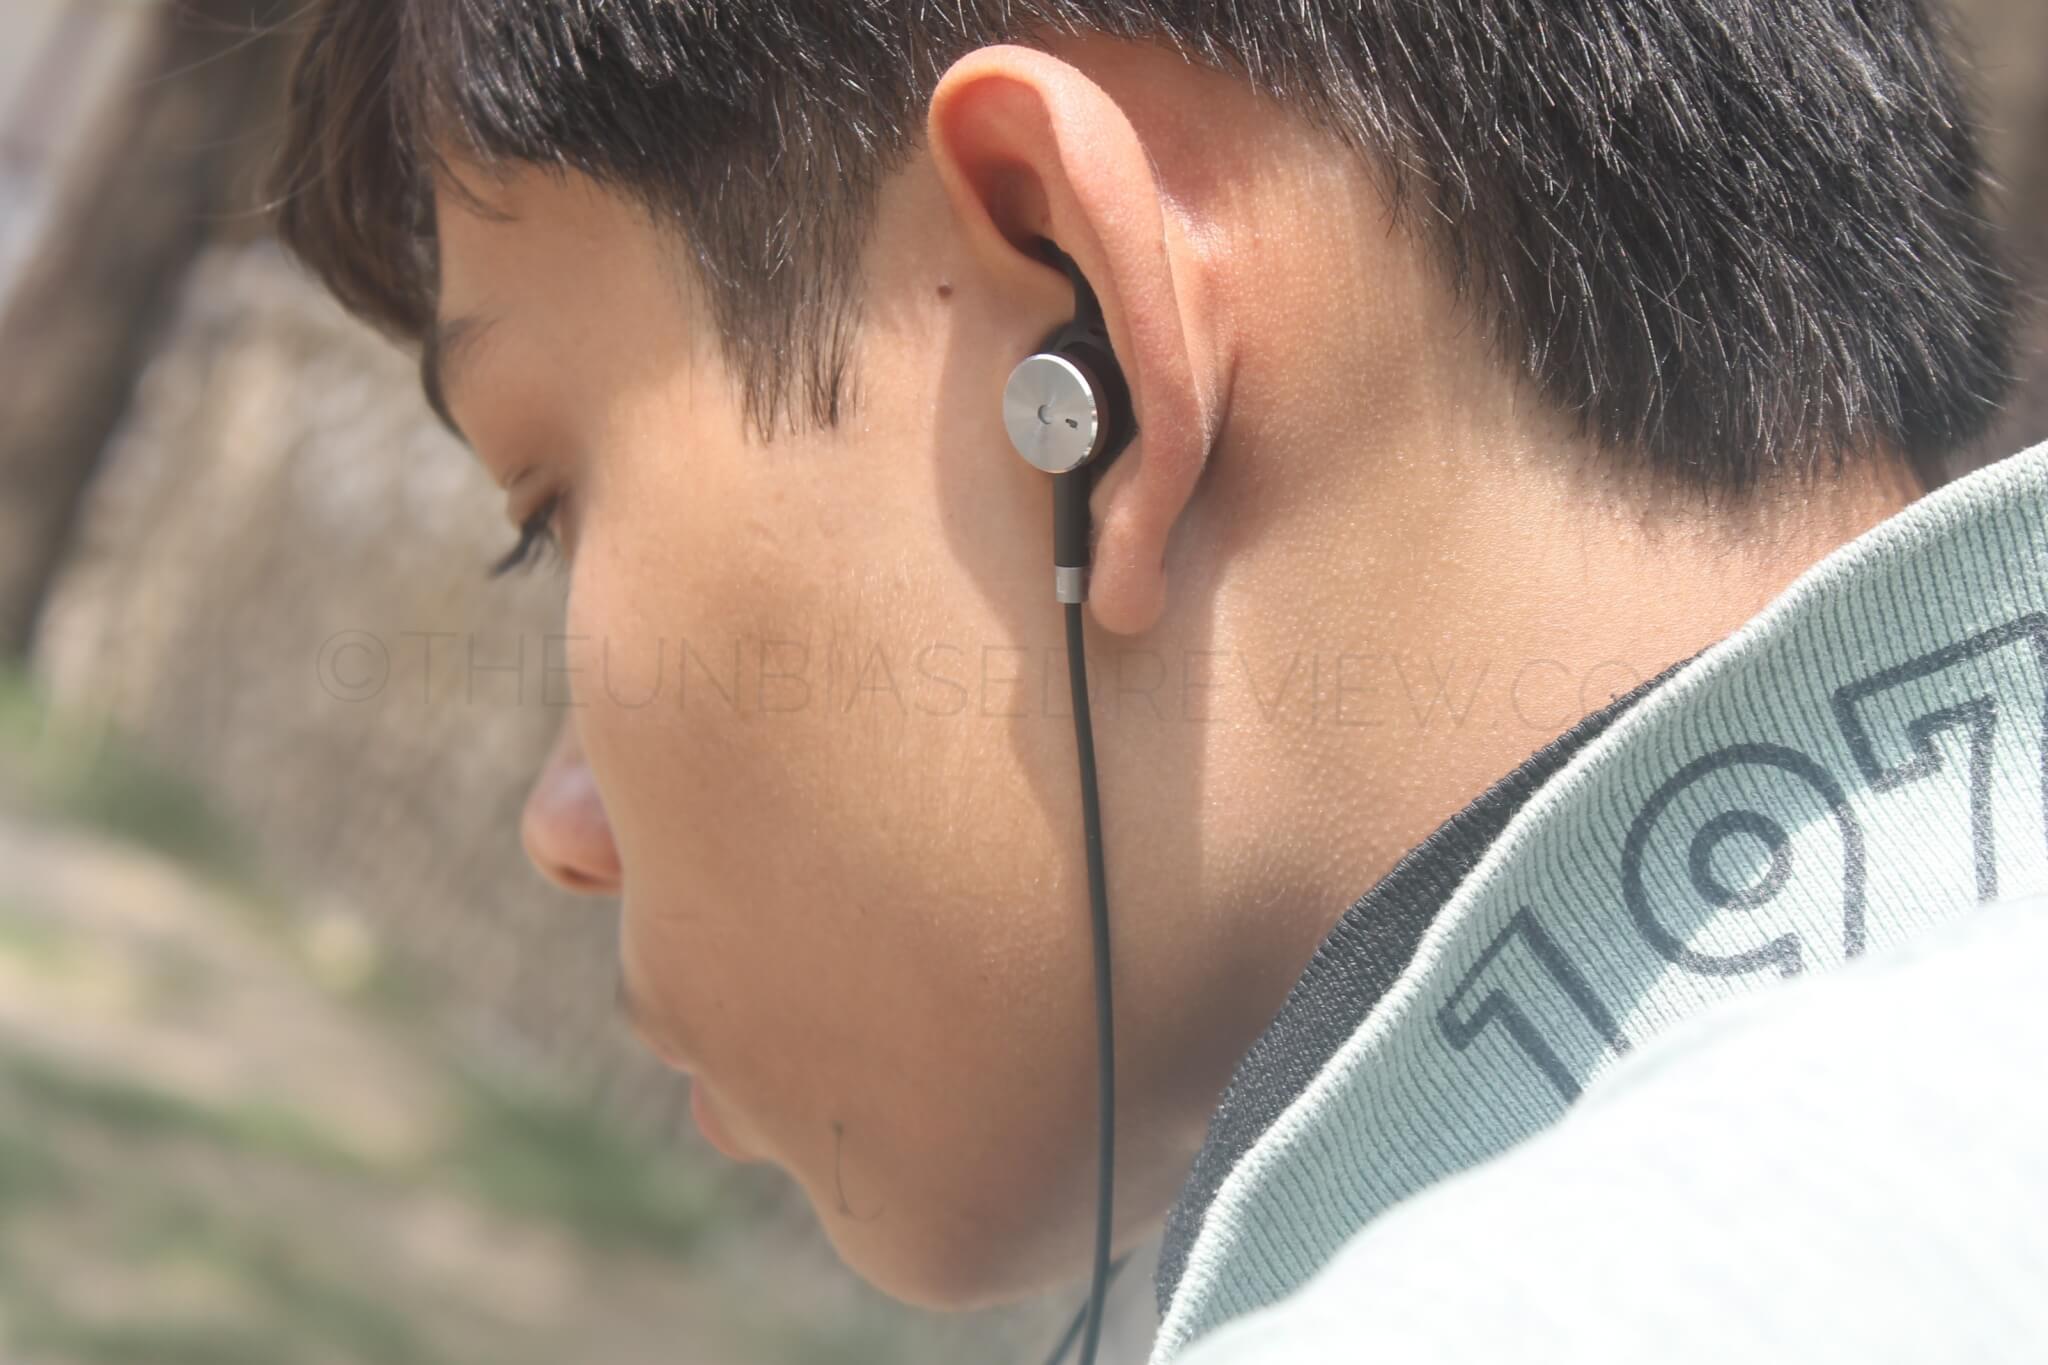 Infinix, infinix quiet 2, quiet 2, infinix quiet 2 review, quiet 2 review, infinix earphones, quiet 2 earphones